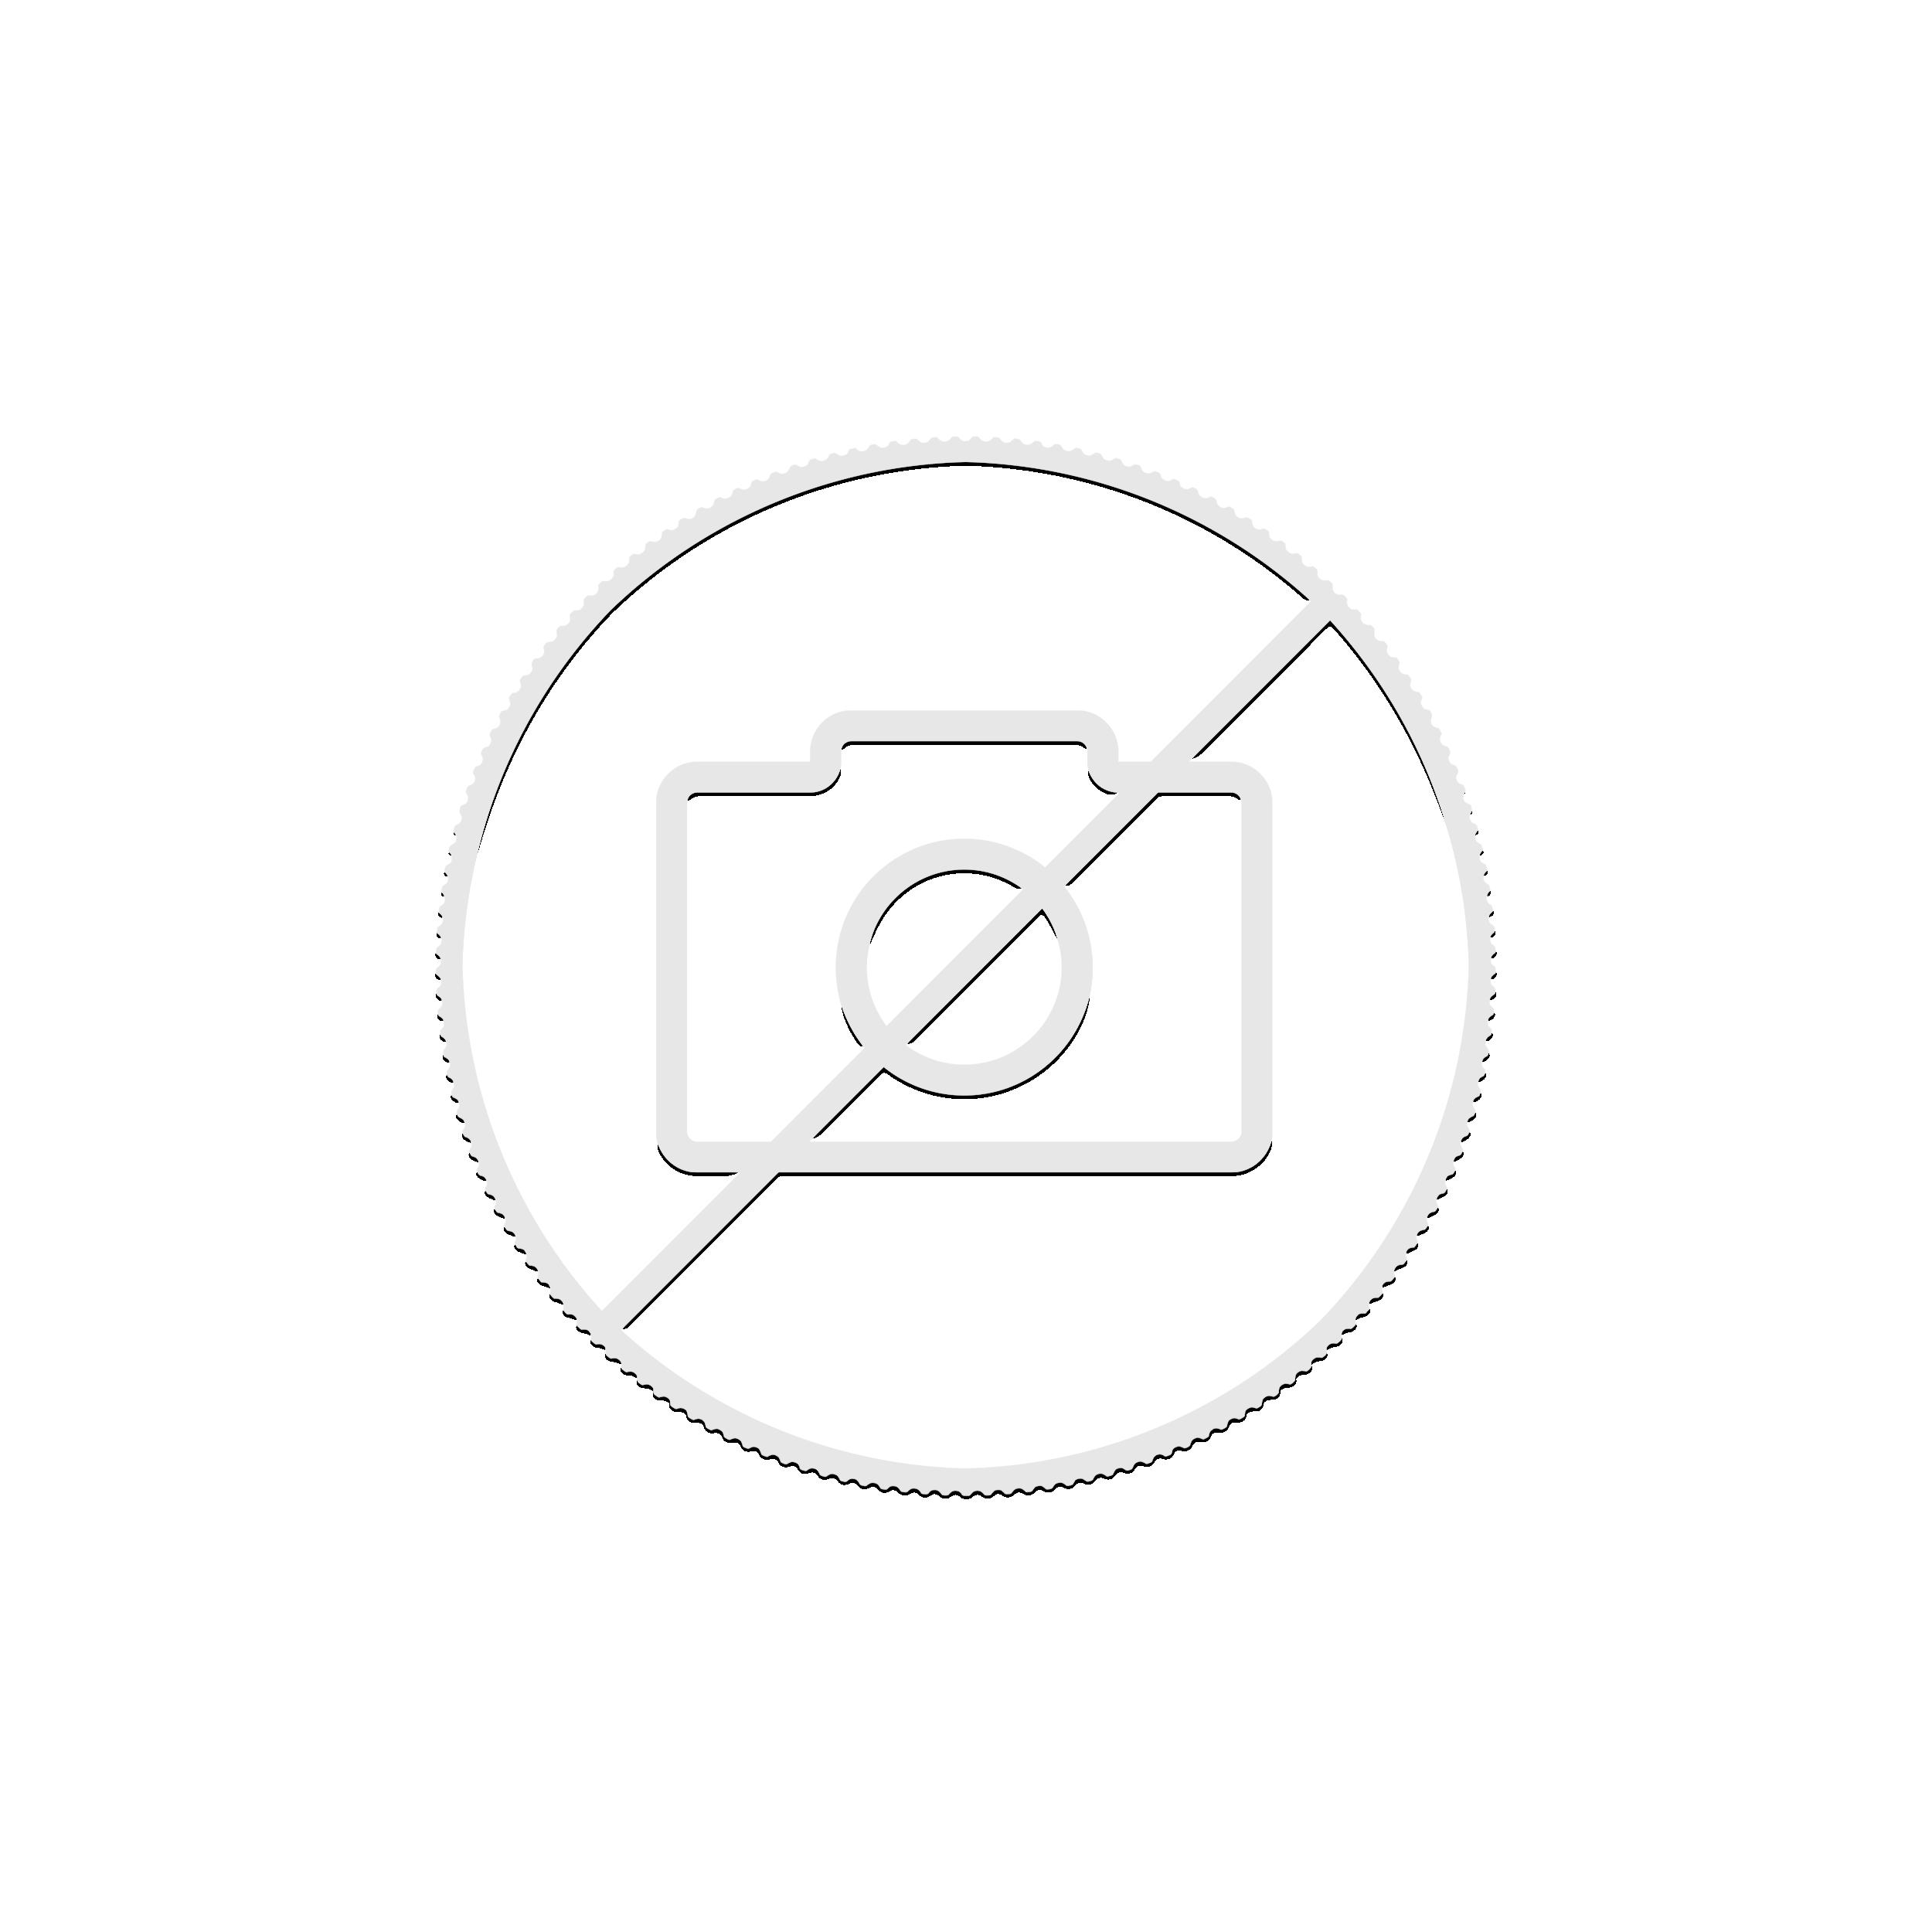 Doosje van 10x Leuchtturm muntcapsules 16.5 mm